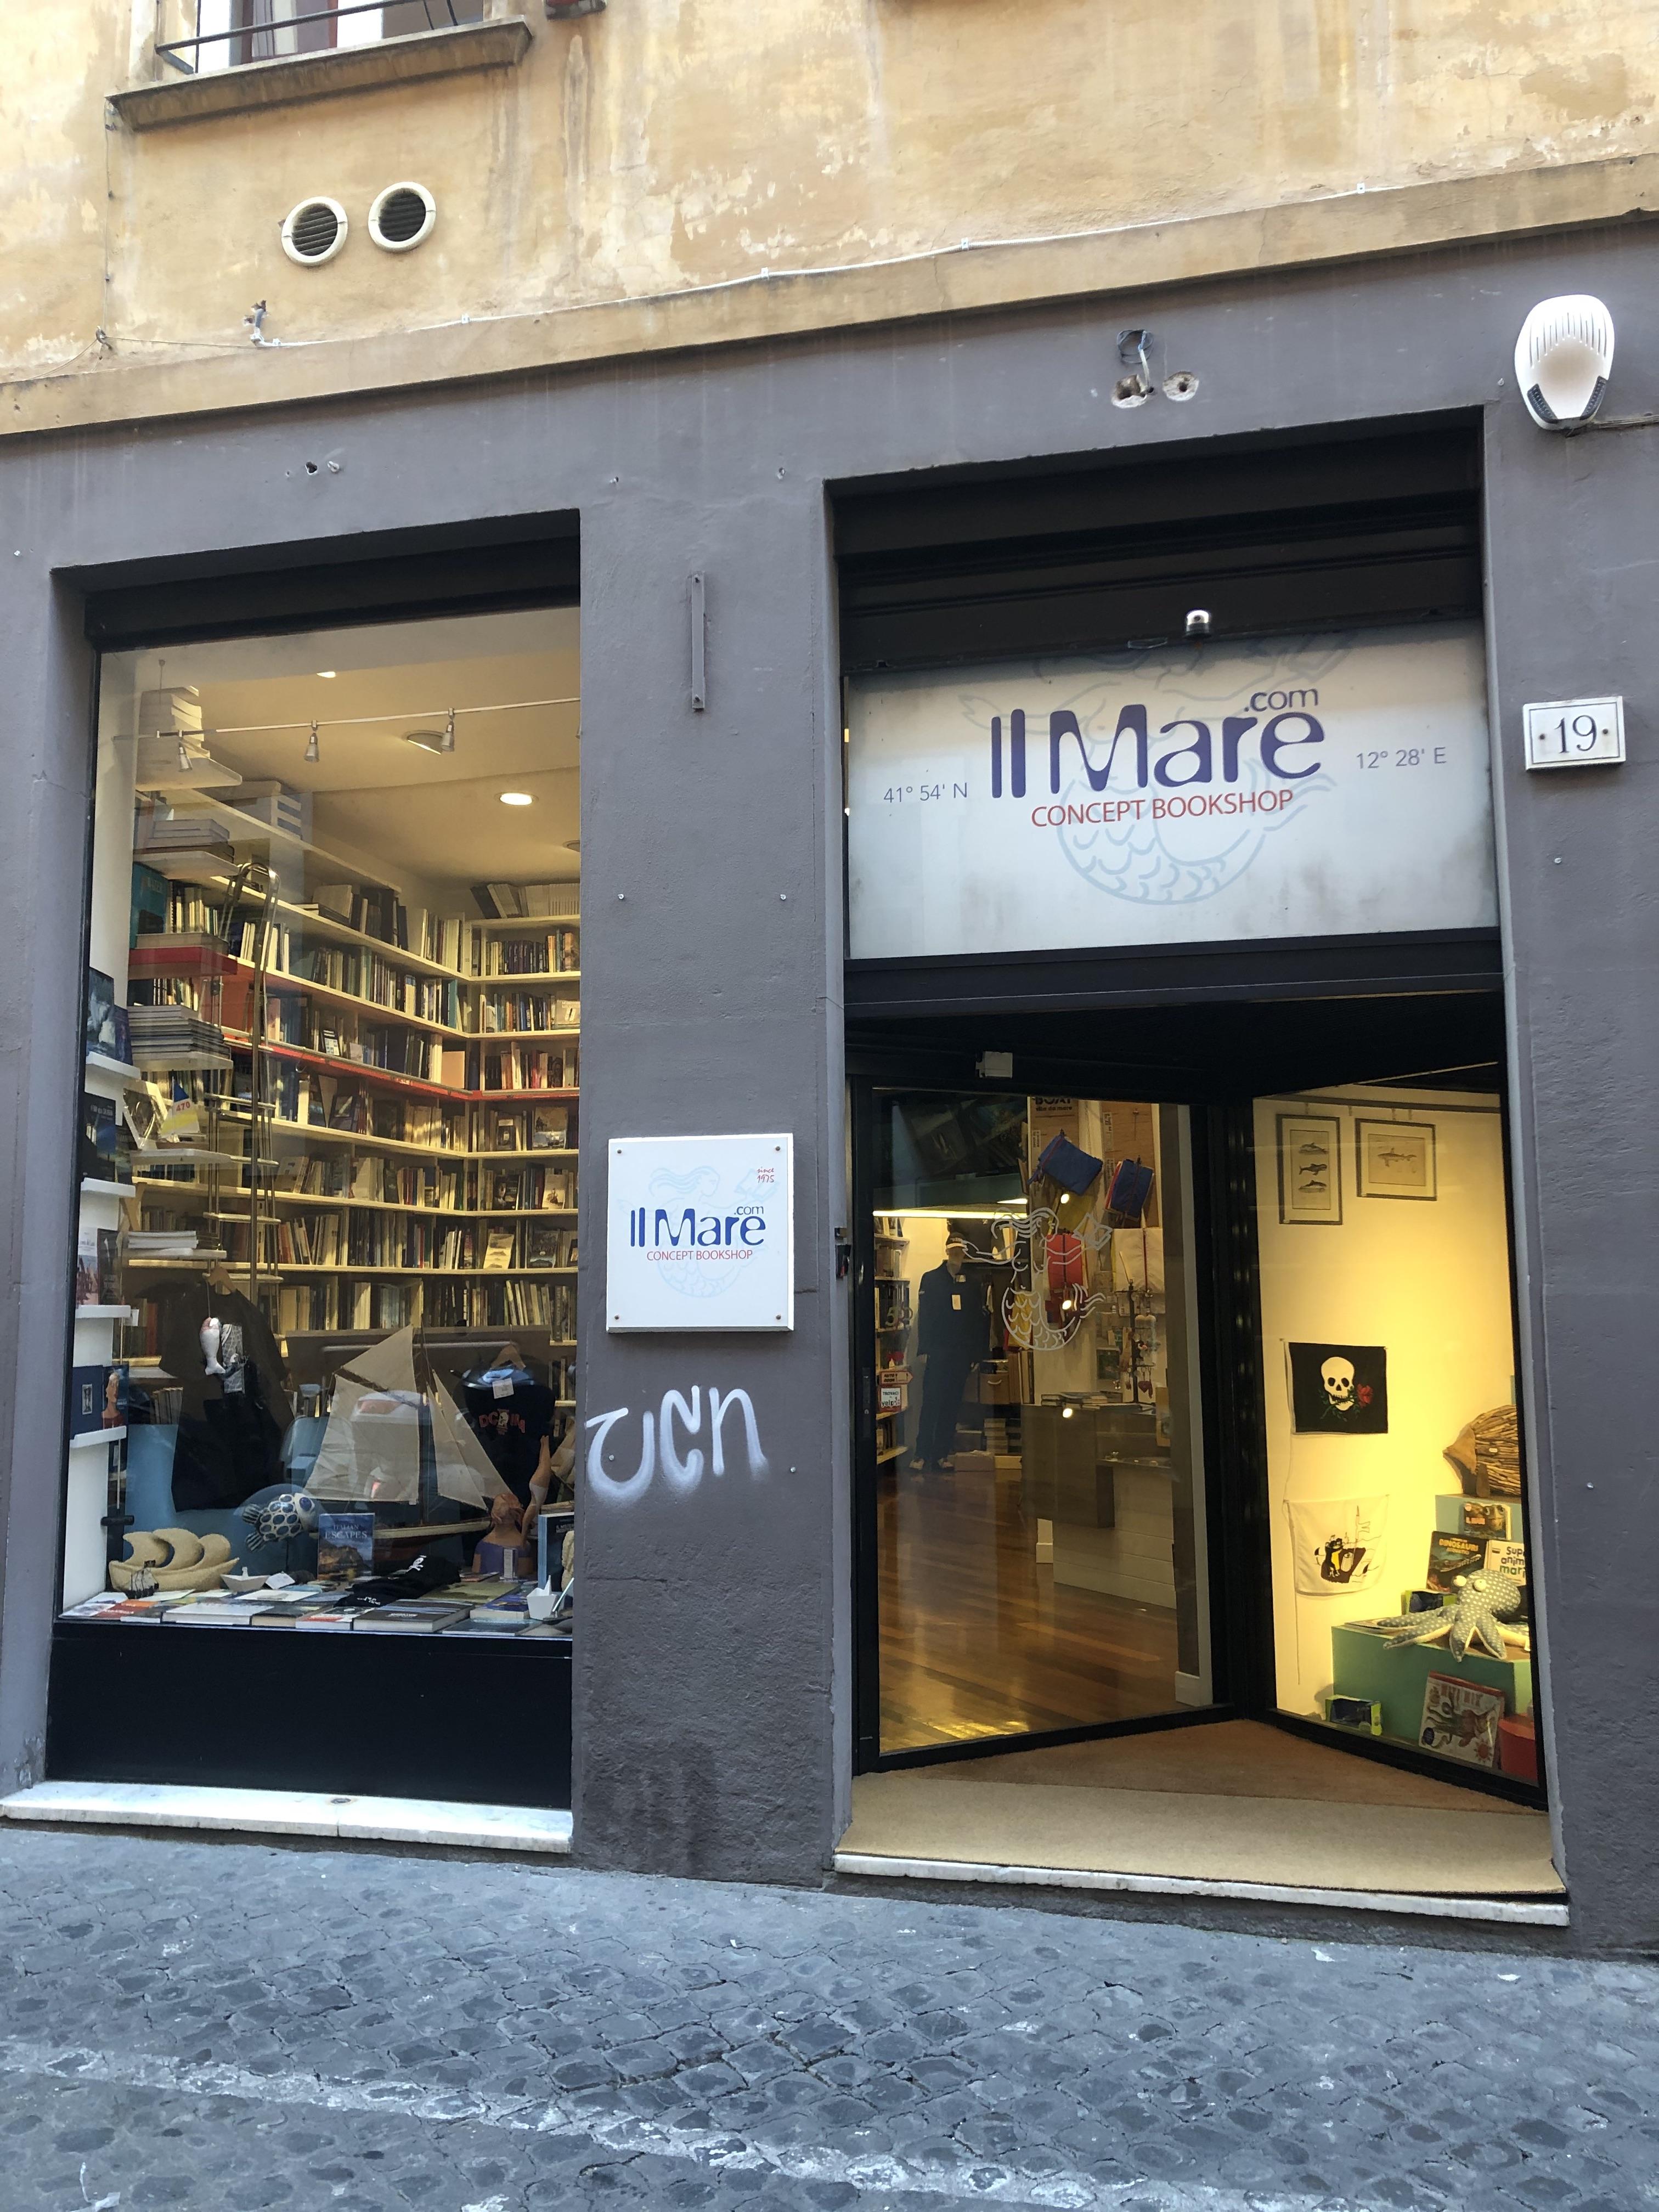 1 Libreria Il Marejpg